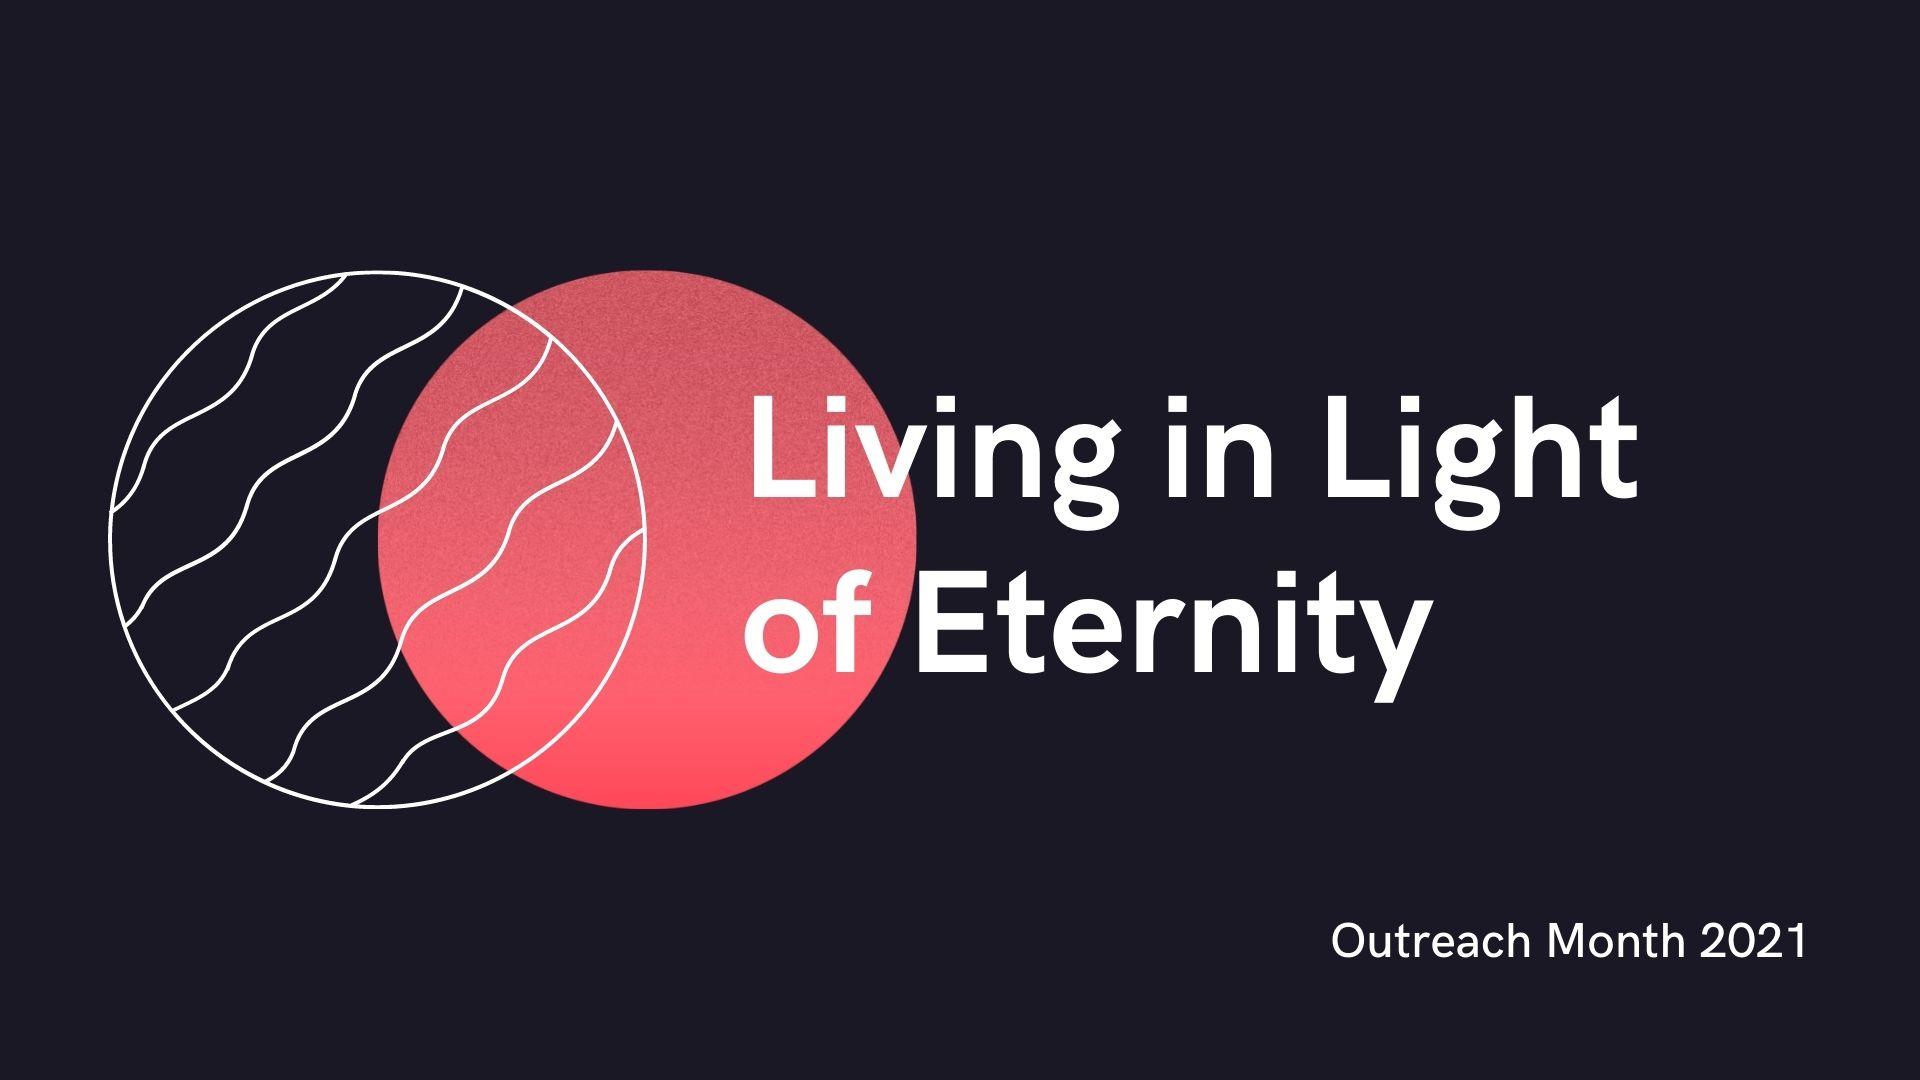 Living in Light of Eternity (2 Corinthians 5:6-10)